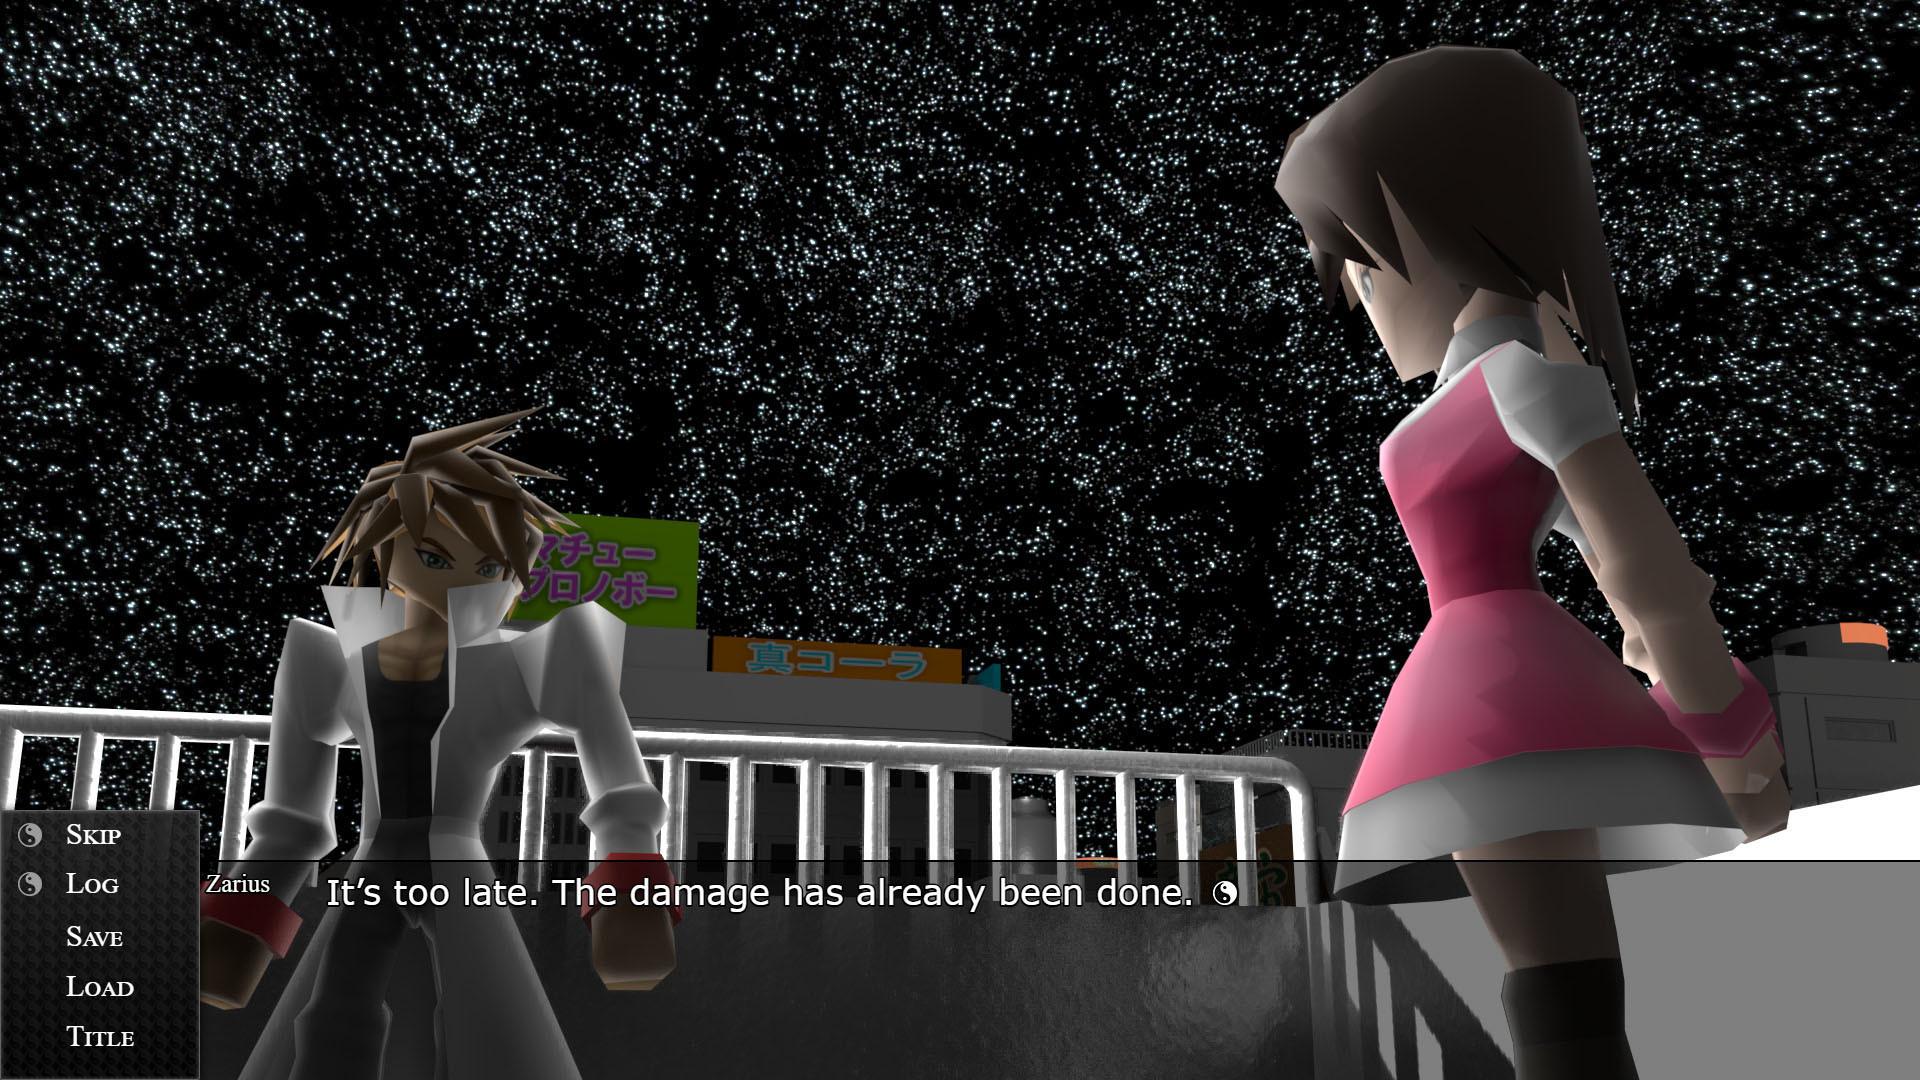 Image 2 - Keizudo: Duels of Love - Mod DB